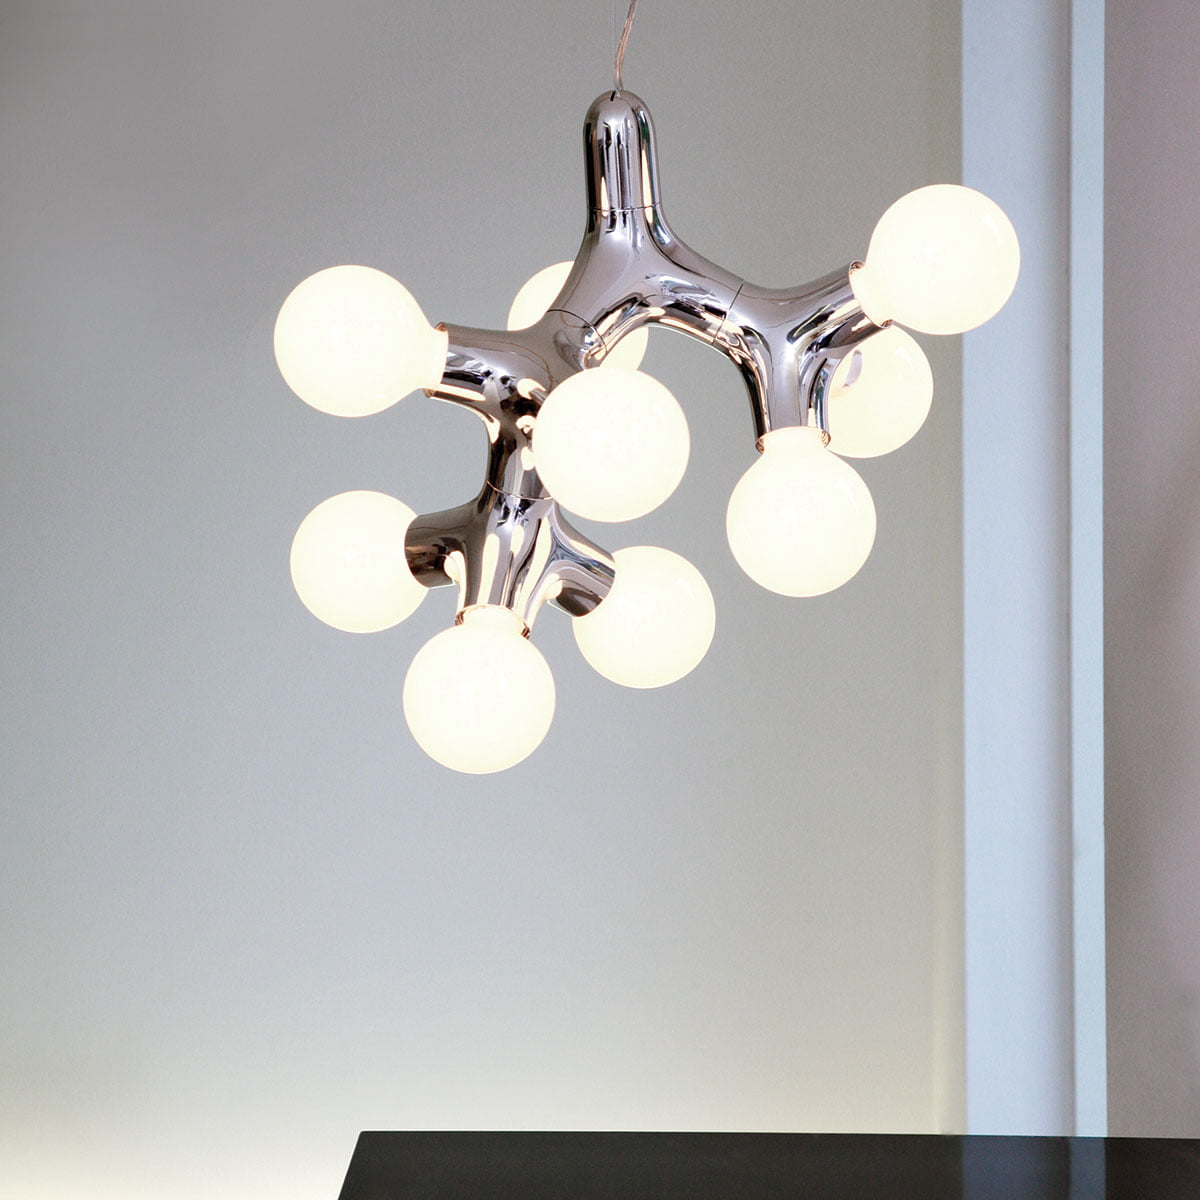 Dna pendant lamp by hopf wortmann for next next dna pendant lamp 0 1 2 chrome mozeypictures Images